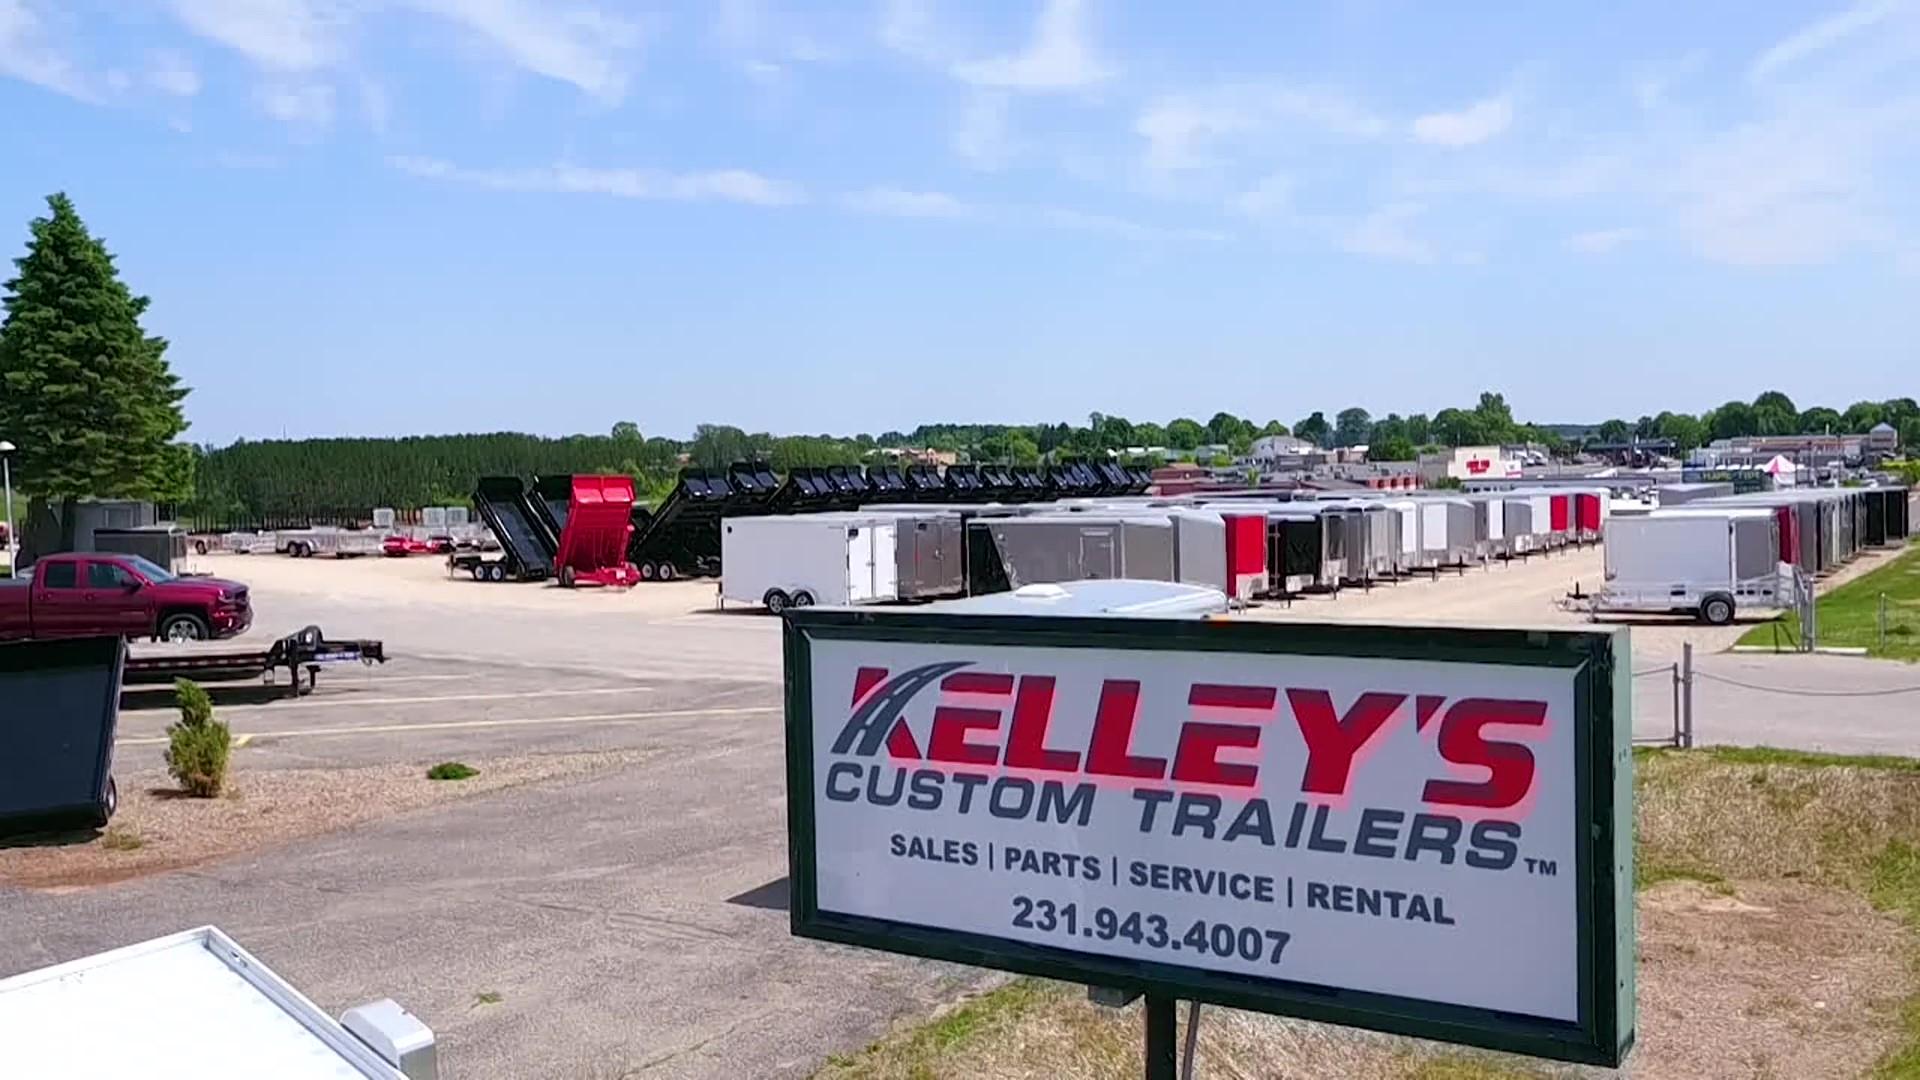 Home   Kelleys Custom Trailers in Traverse City MI   Utility